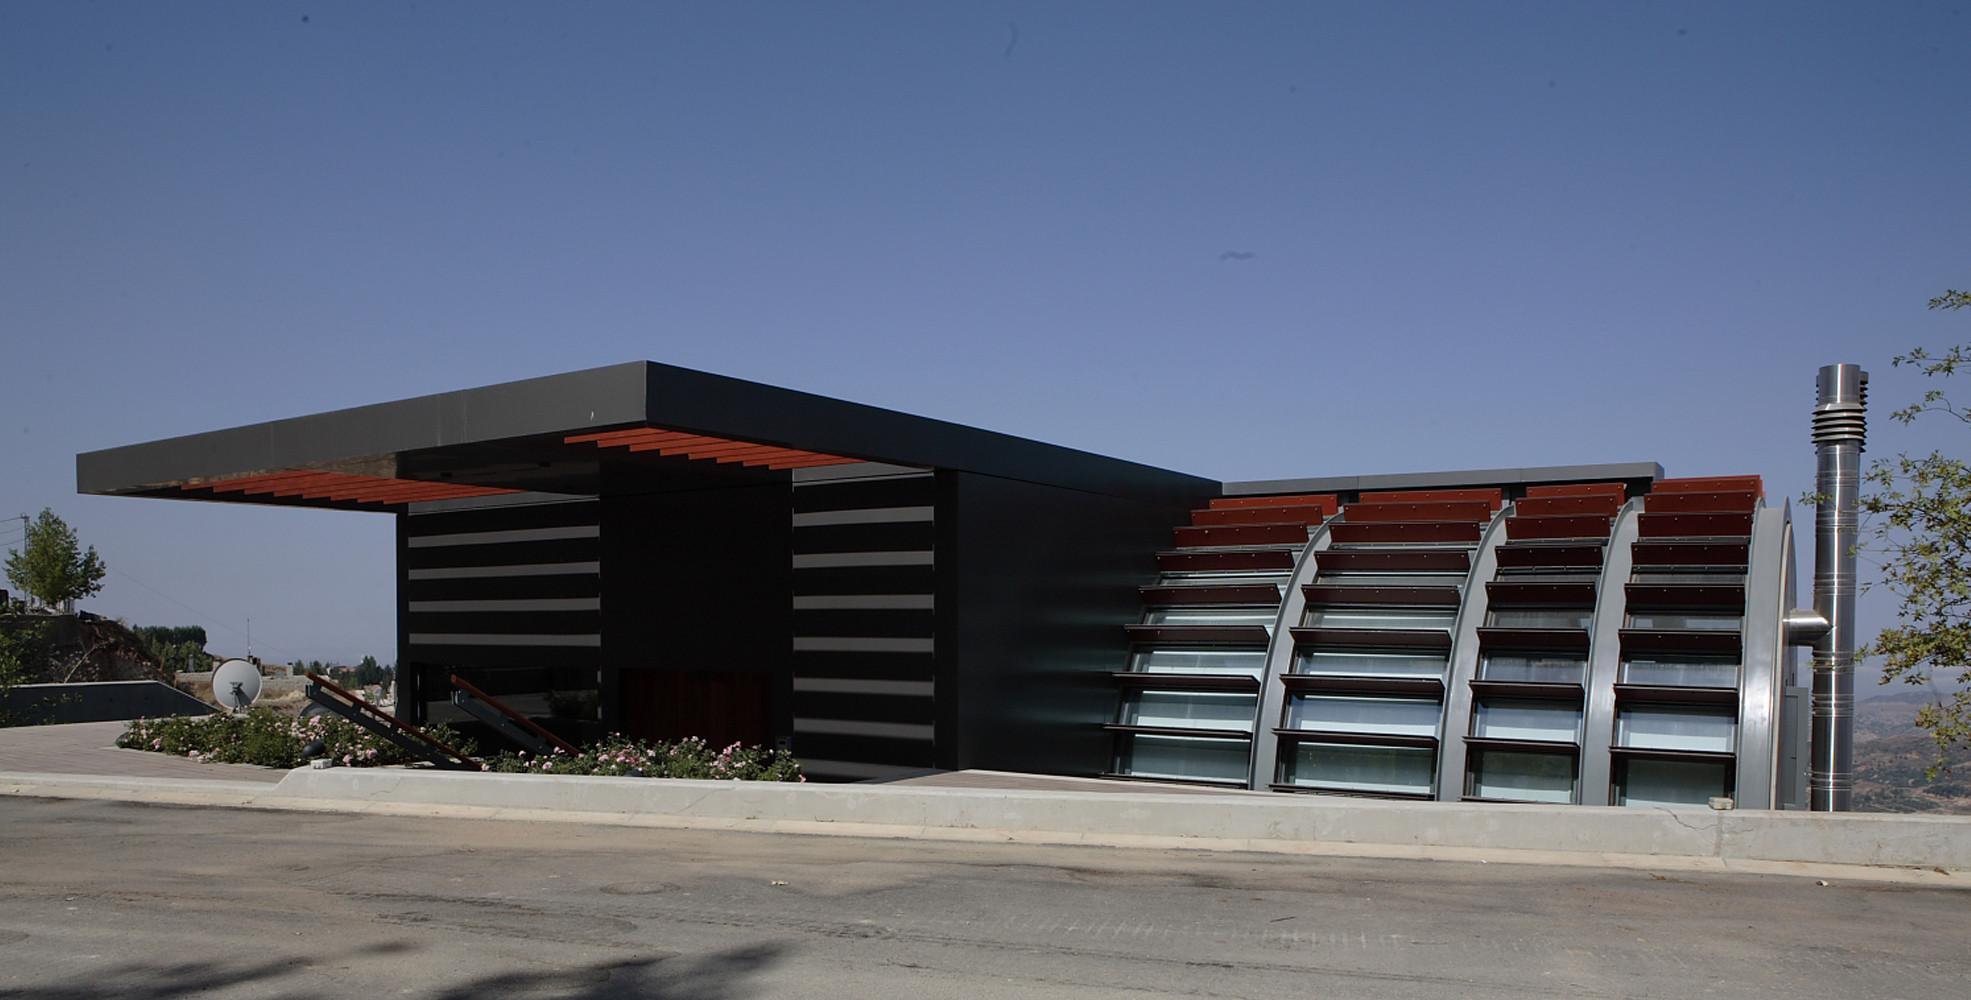 Plot 7950 / Bernard Khoury Architects, © Bernard Khoury Architects